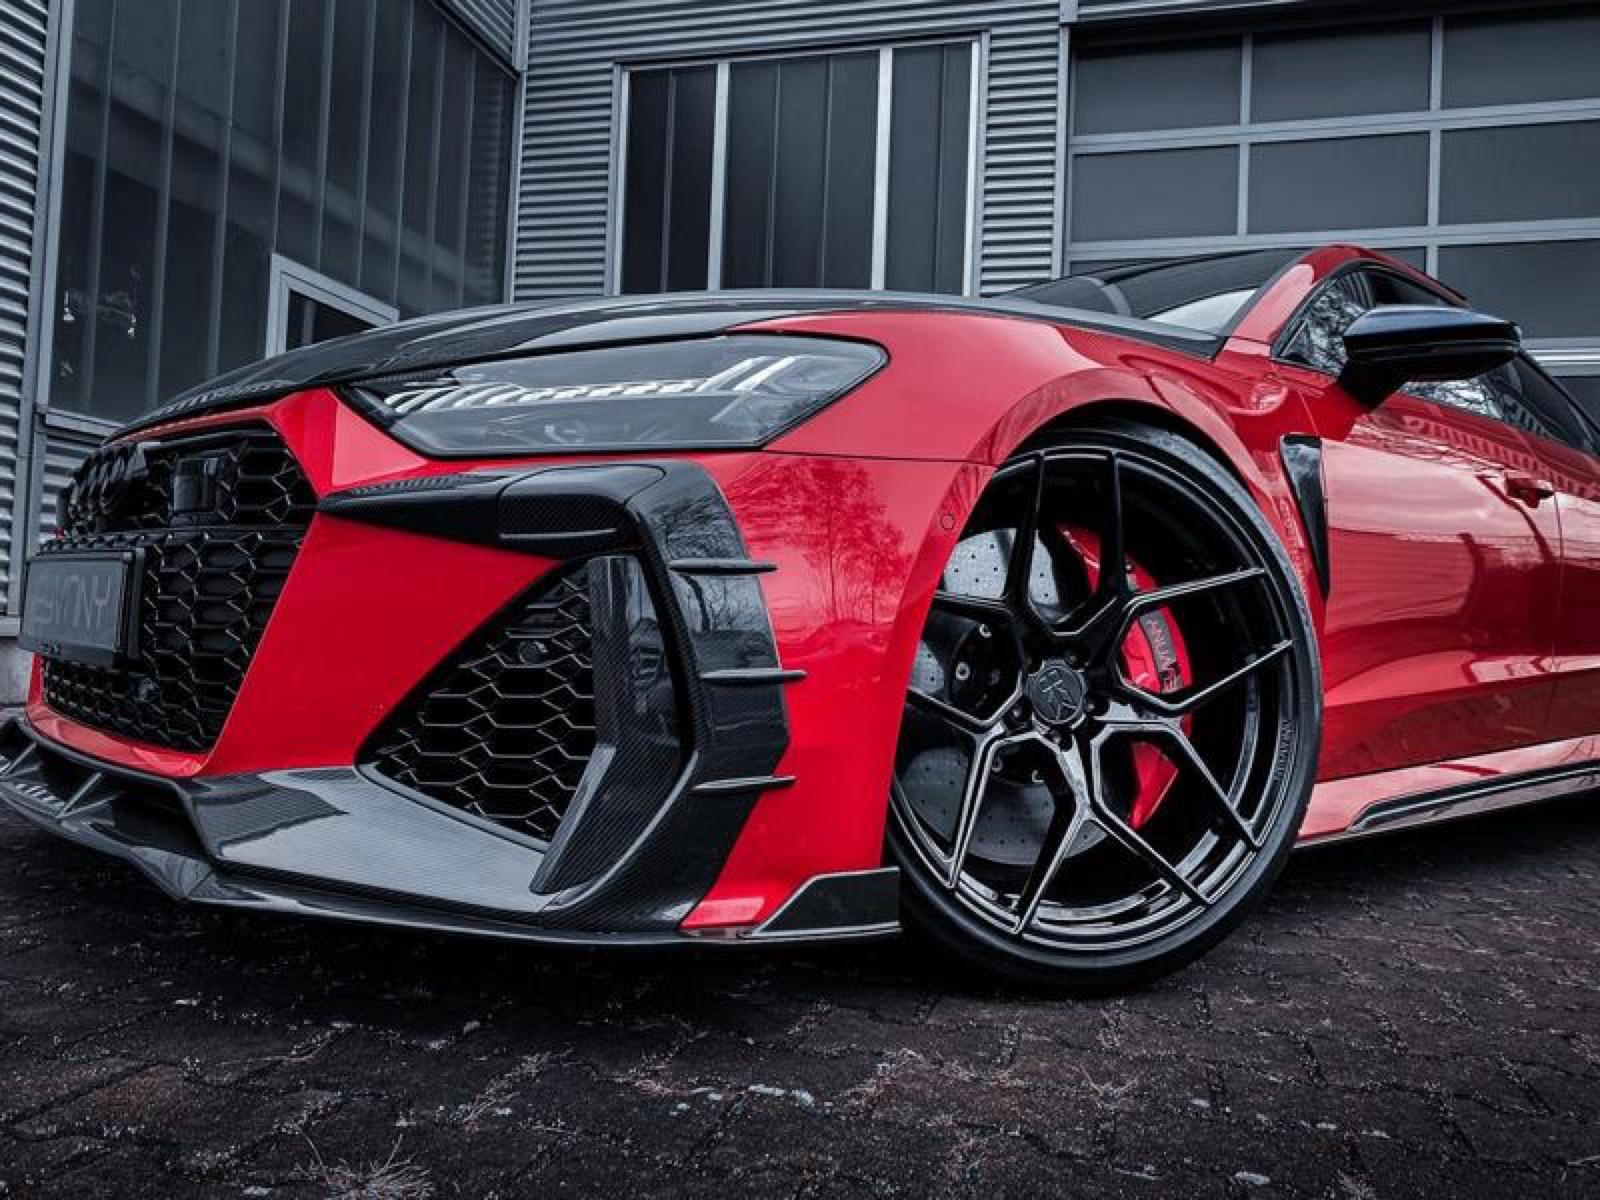 Audi-RS7-by-Keyvany-8